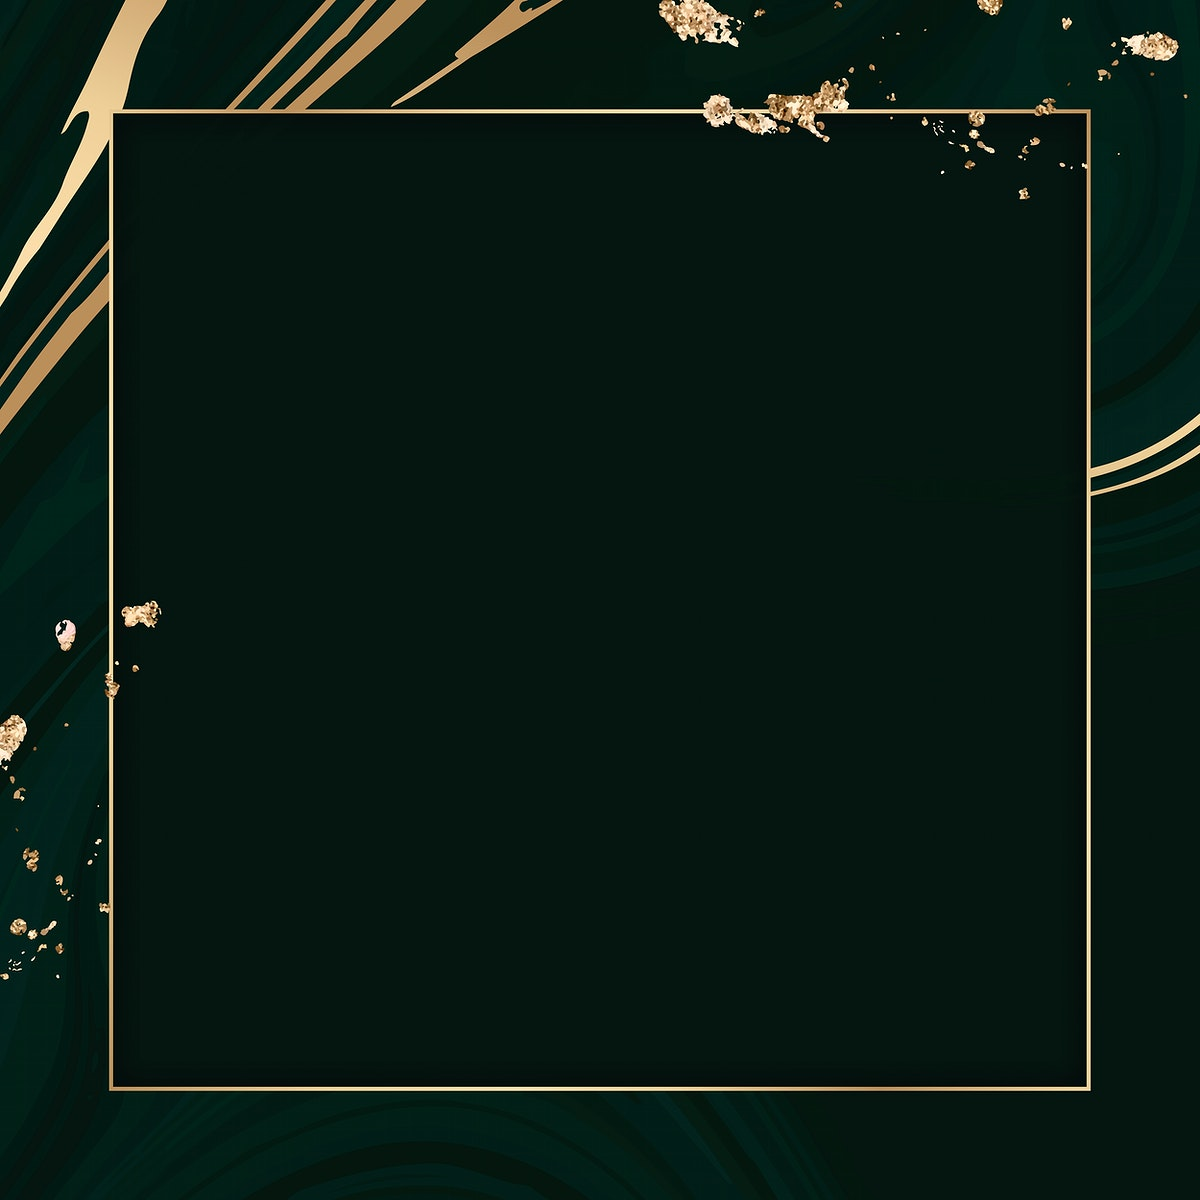 Square gold frame on a black fluid patterned background vector